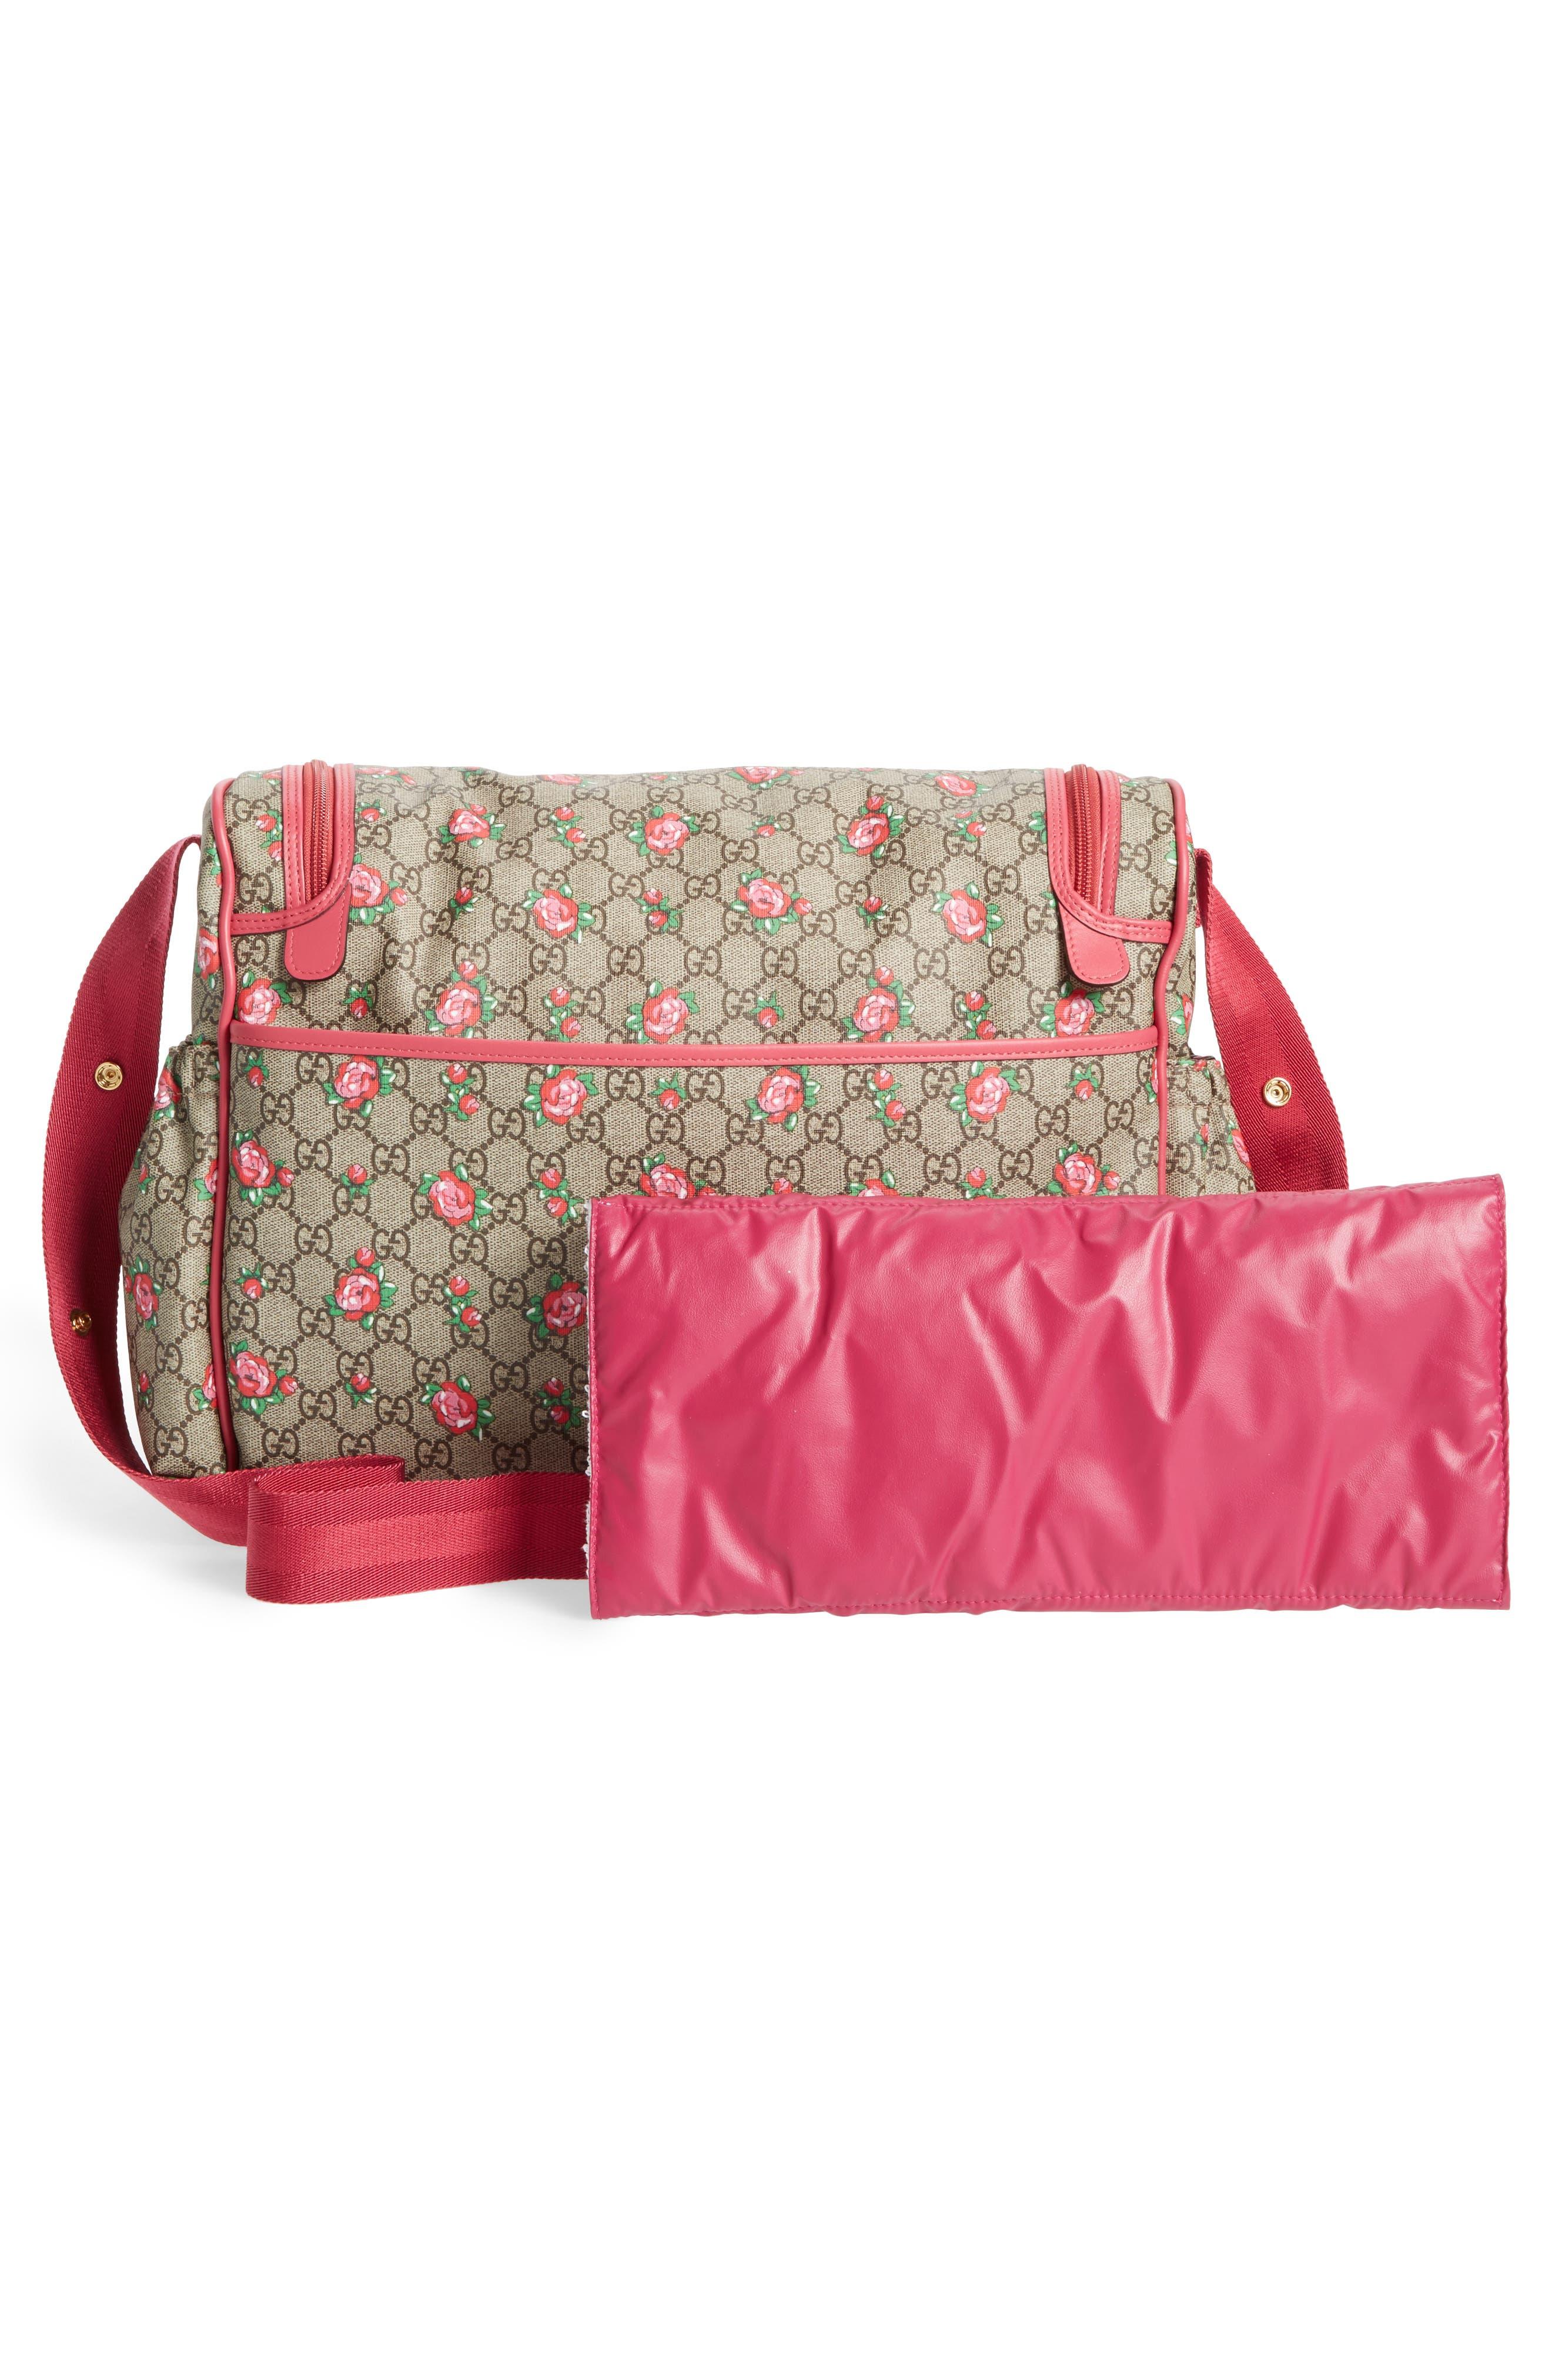 Rose Bud GG Supreme Diaper Bag,                             Alternate thumbnail 3, color,